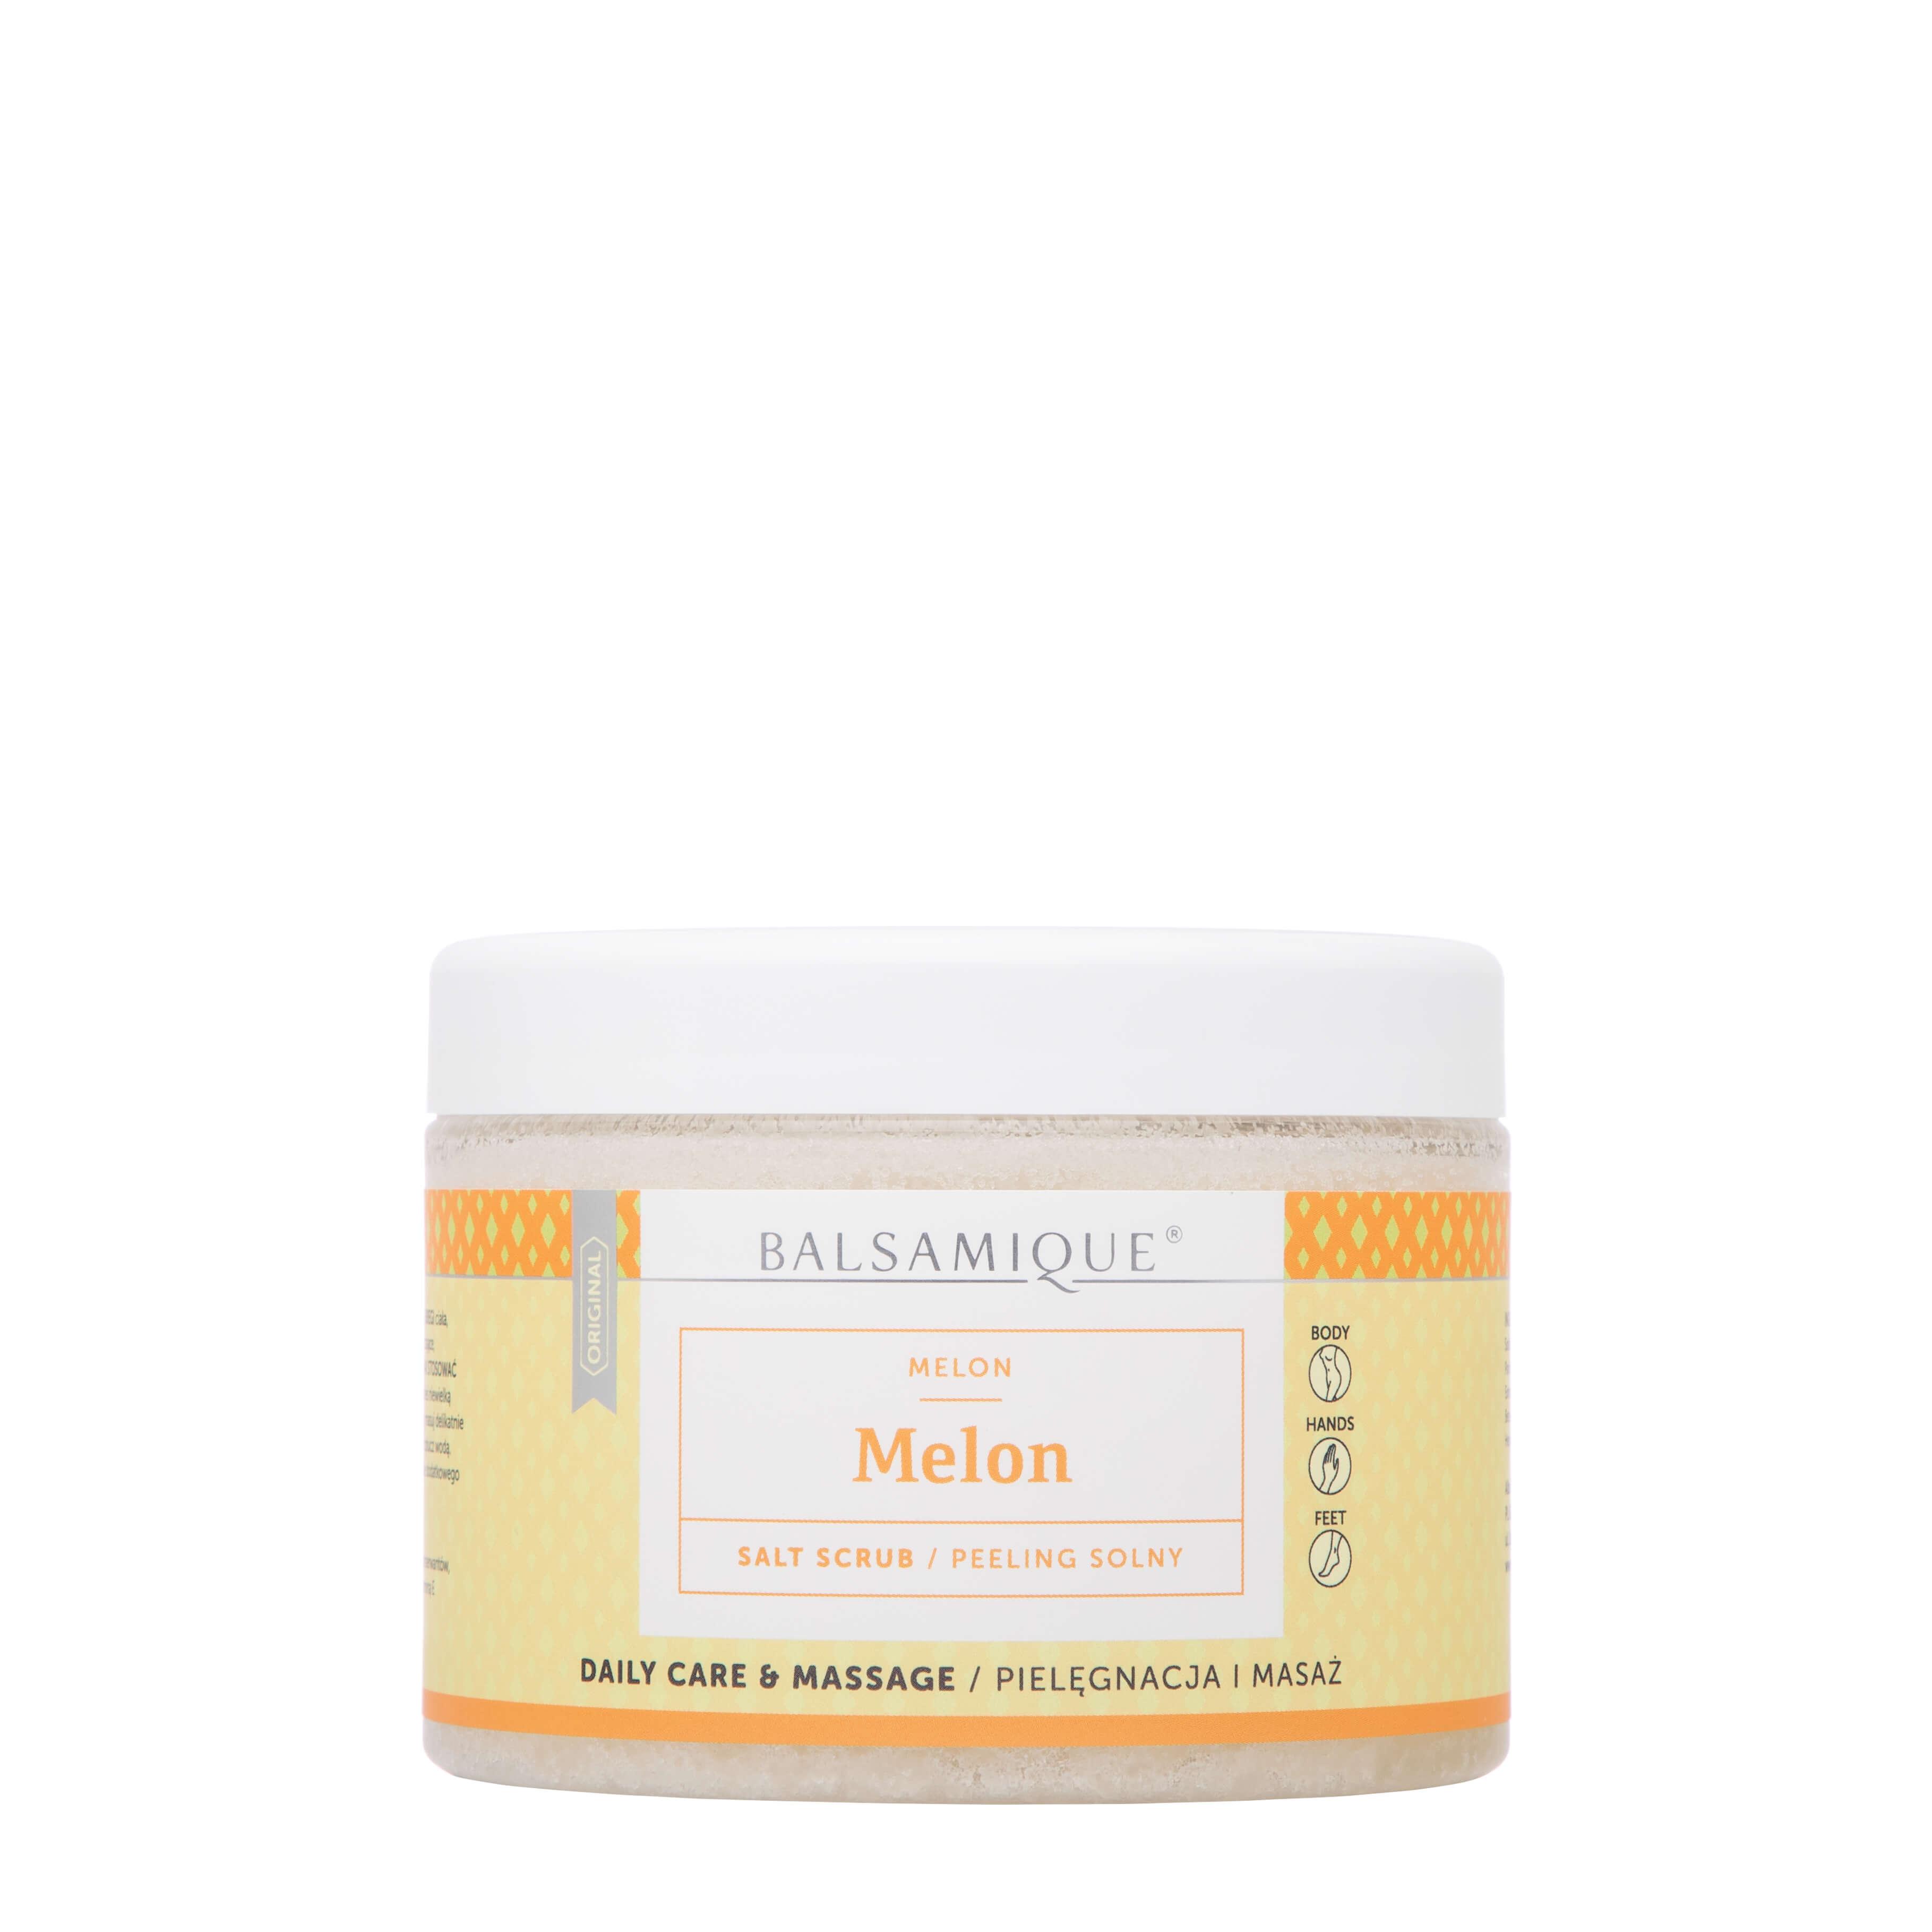 Balsamique Peeling solny 550g